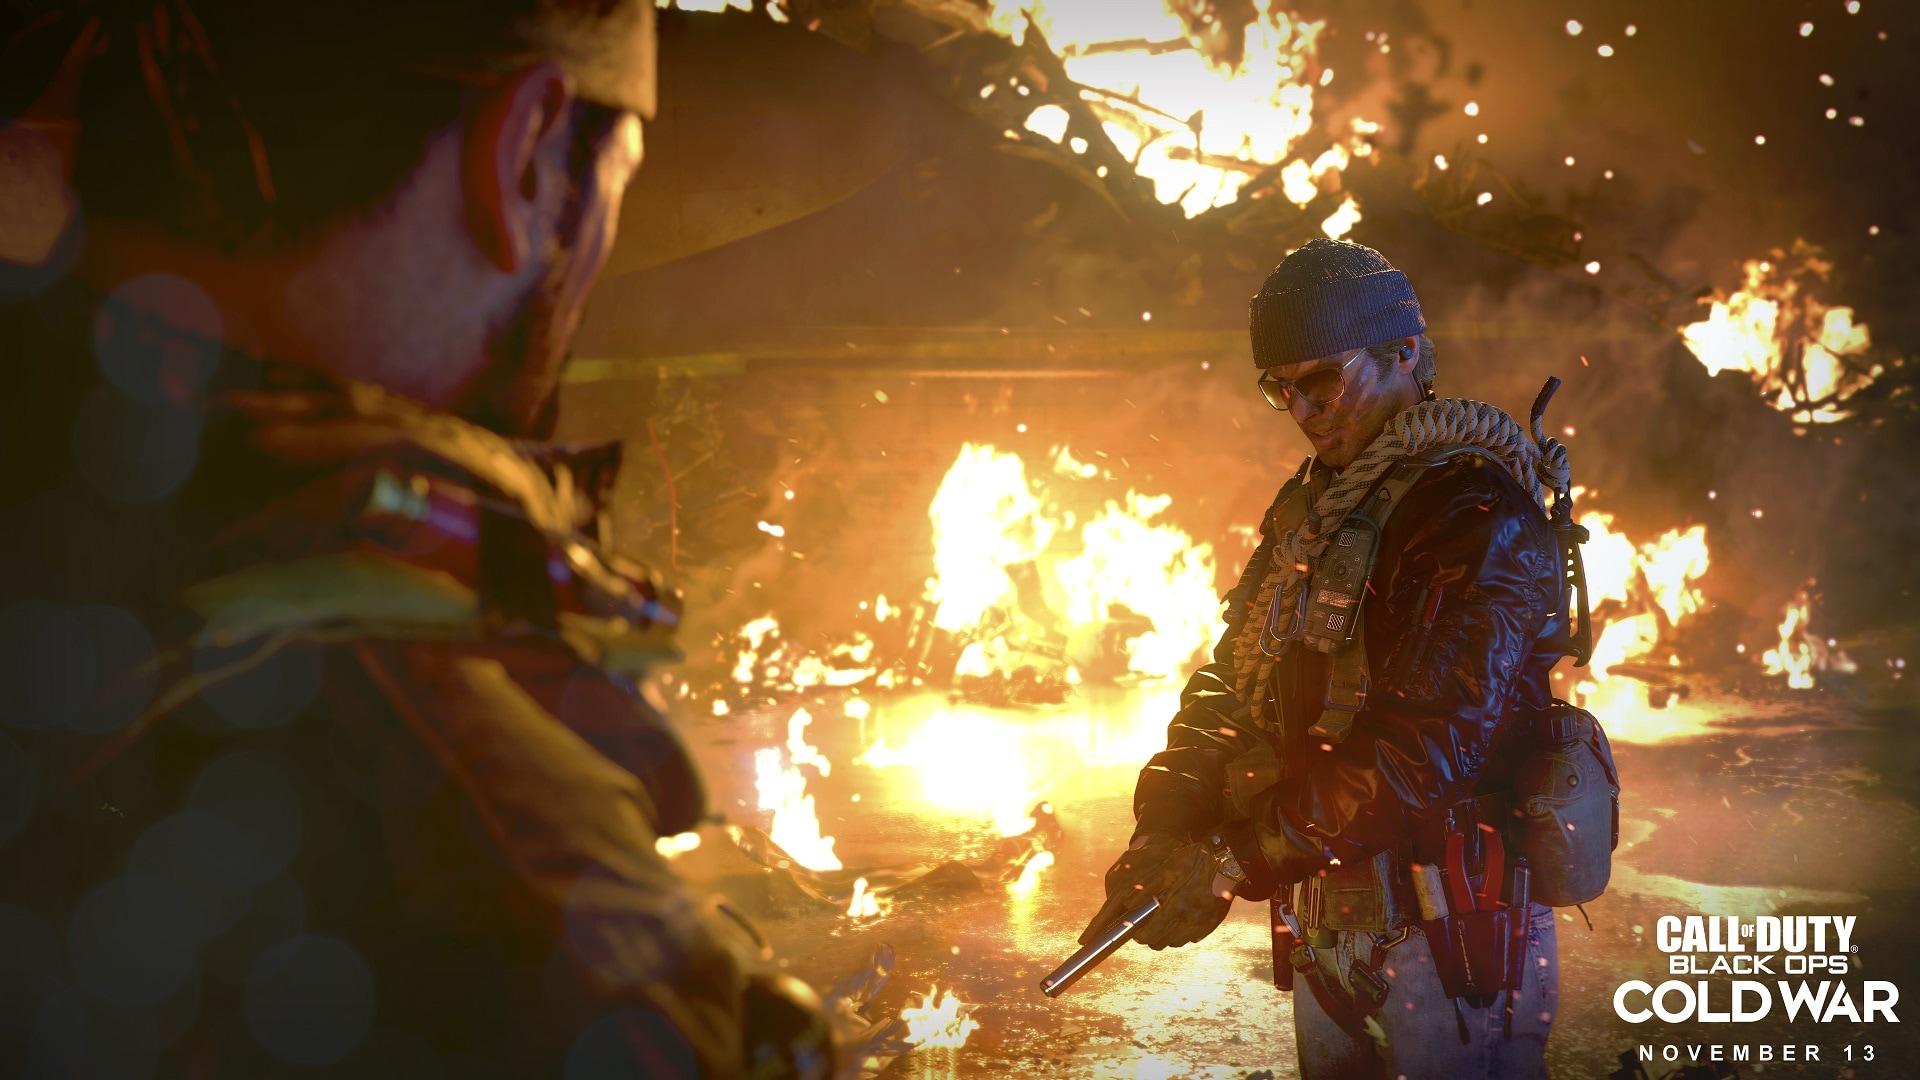 Call of Duty Black Ops: Cold War (PC) - Battle.net Key - EUROPE - 4